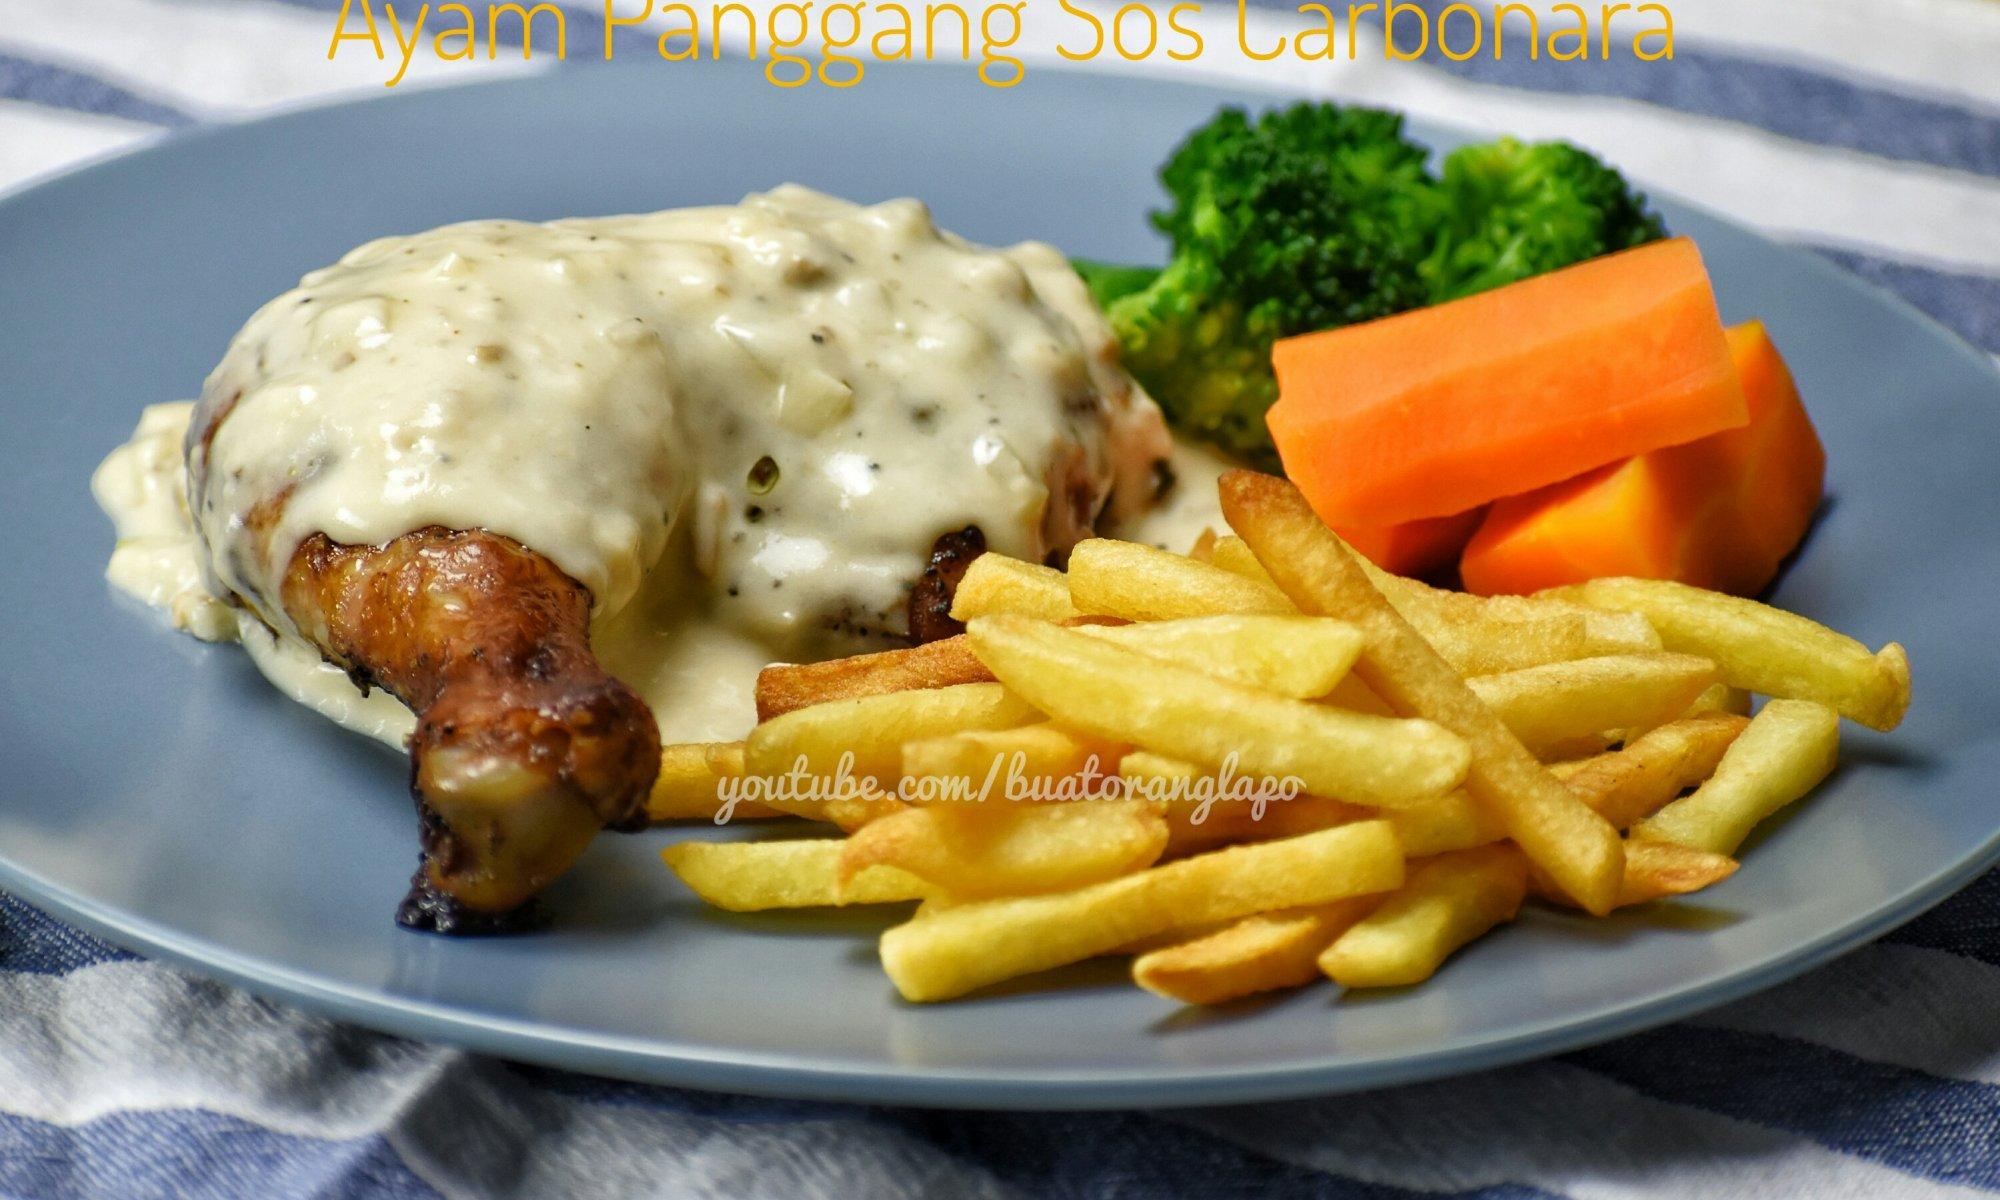 ayam panggang sos carbonara